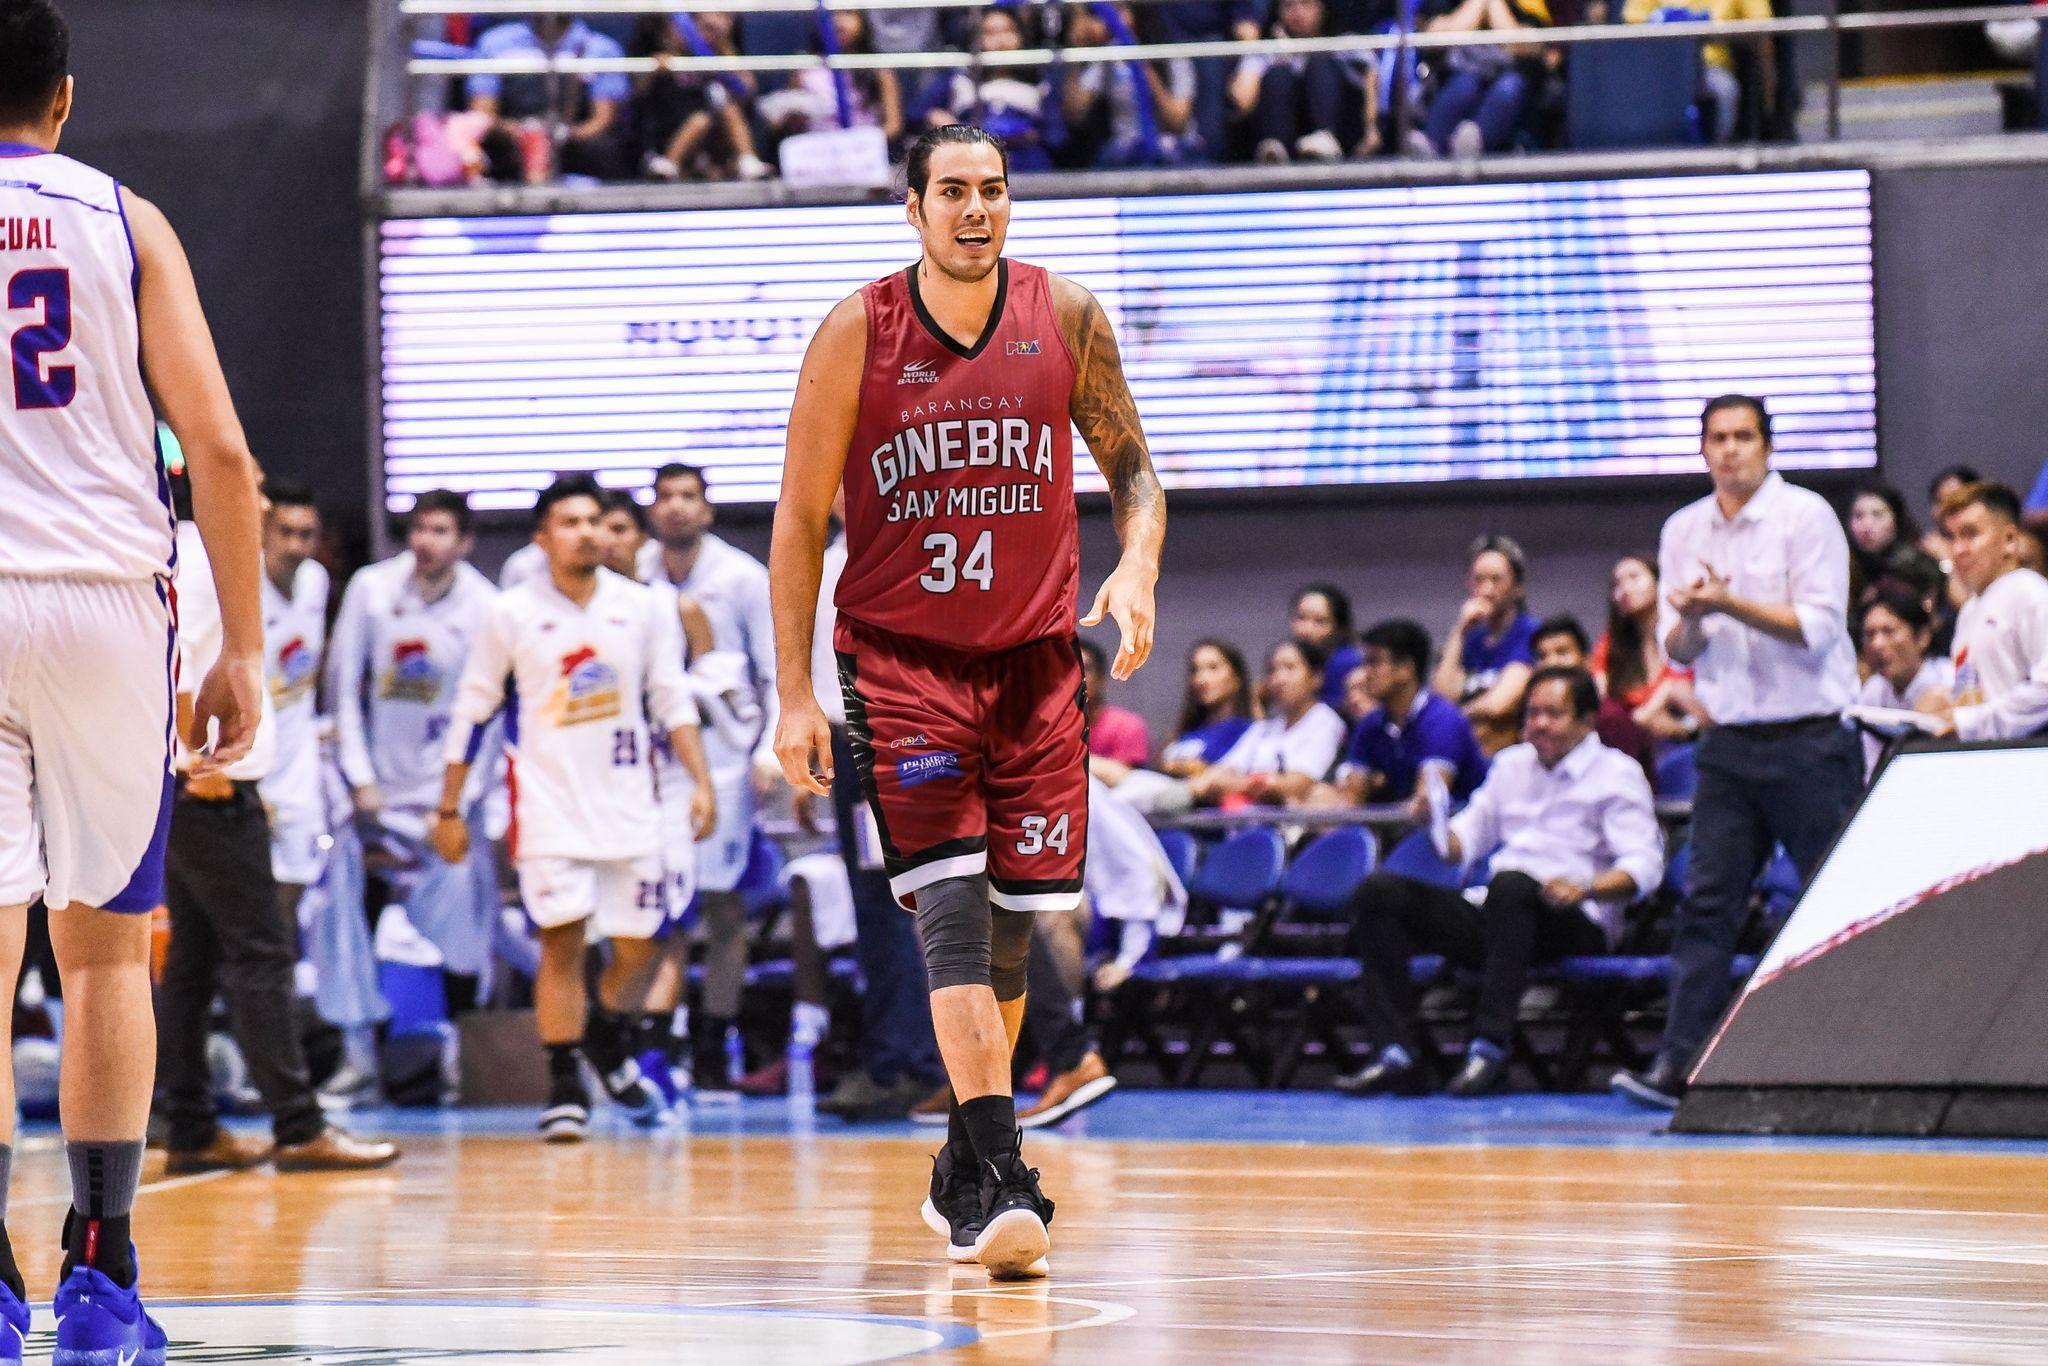 PBA-Season-46-Ginebra-Christian-Standhardinger Leo Austria believes PBA playing field has levelled Basketball News PBA  - philippine sports news